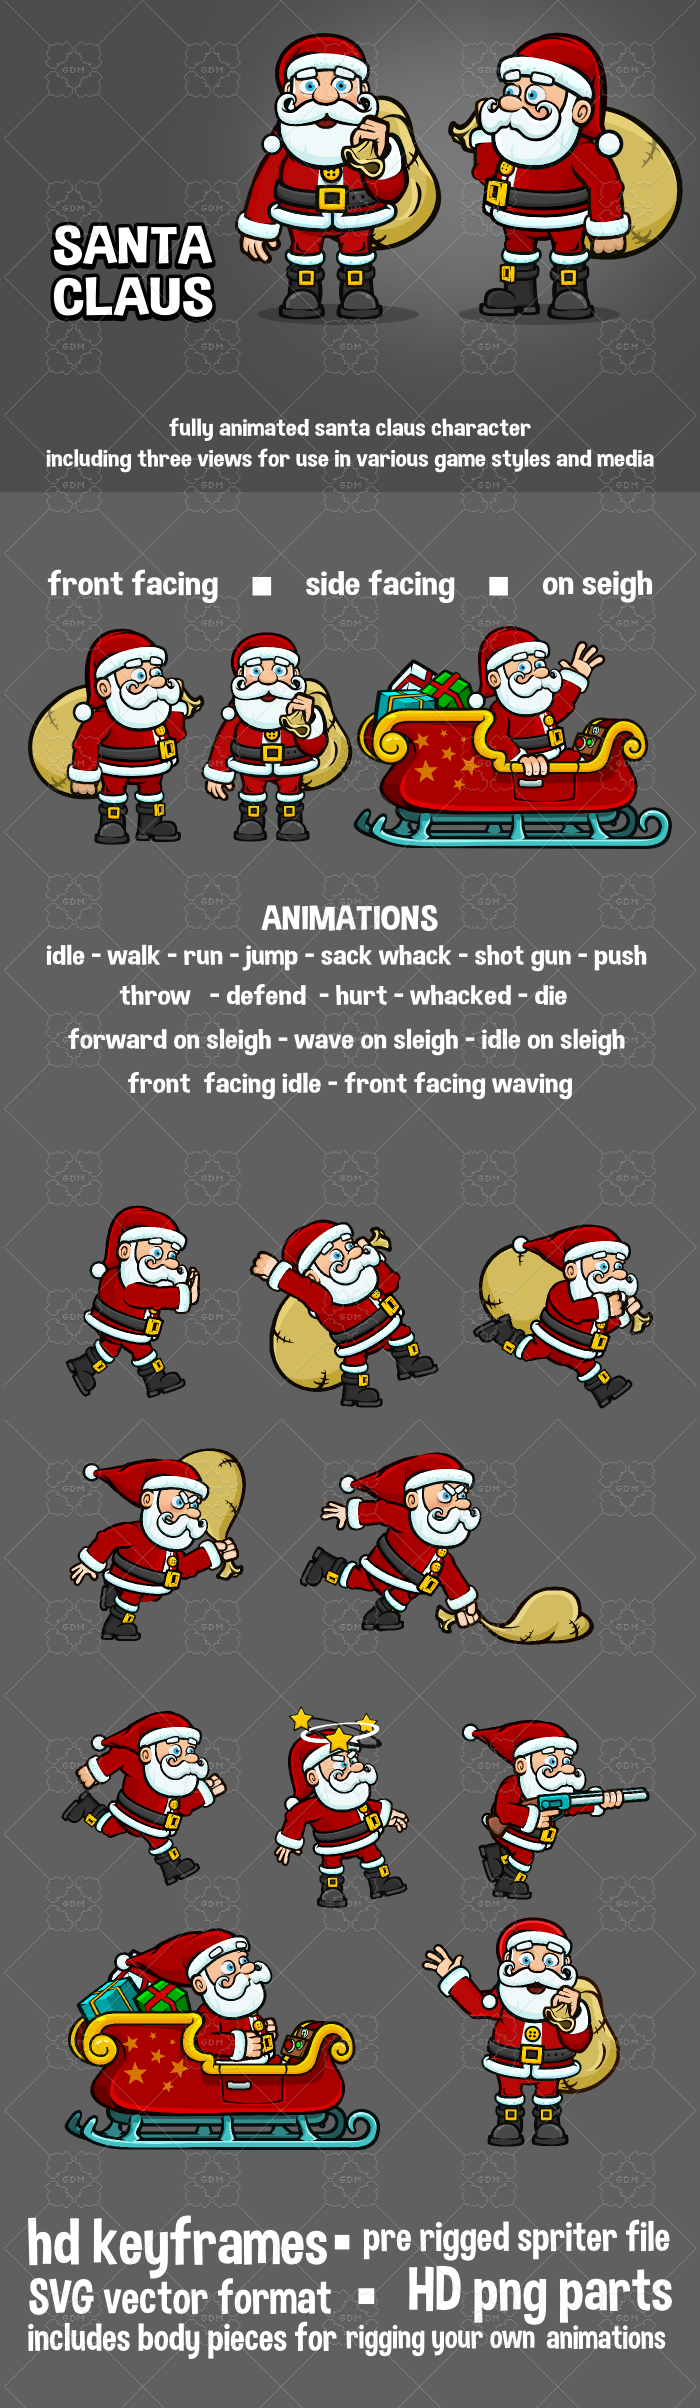 Animated santa clause cartoon character